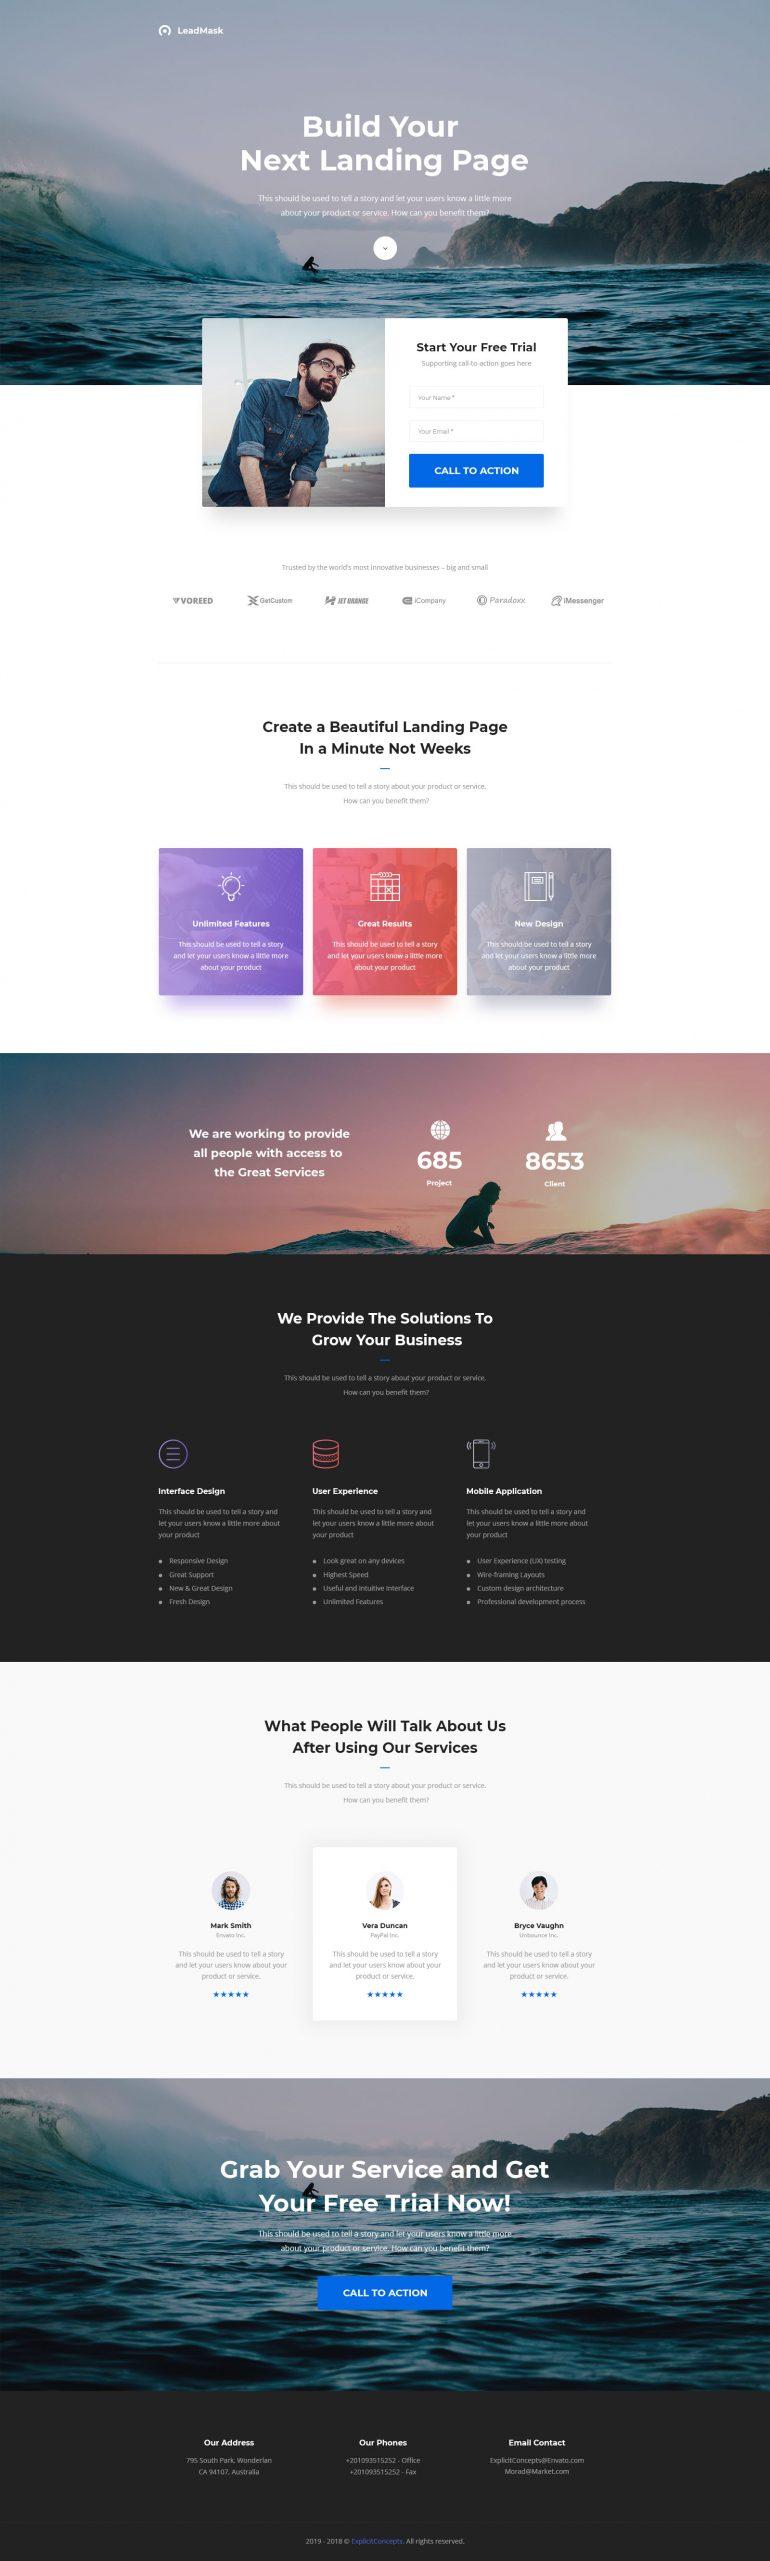 LeadMask – Services Unbounce Landing Page